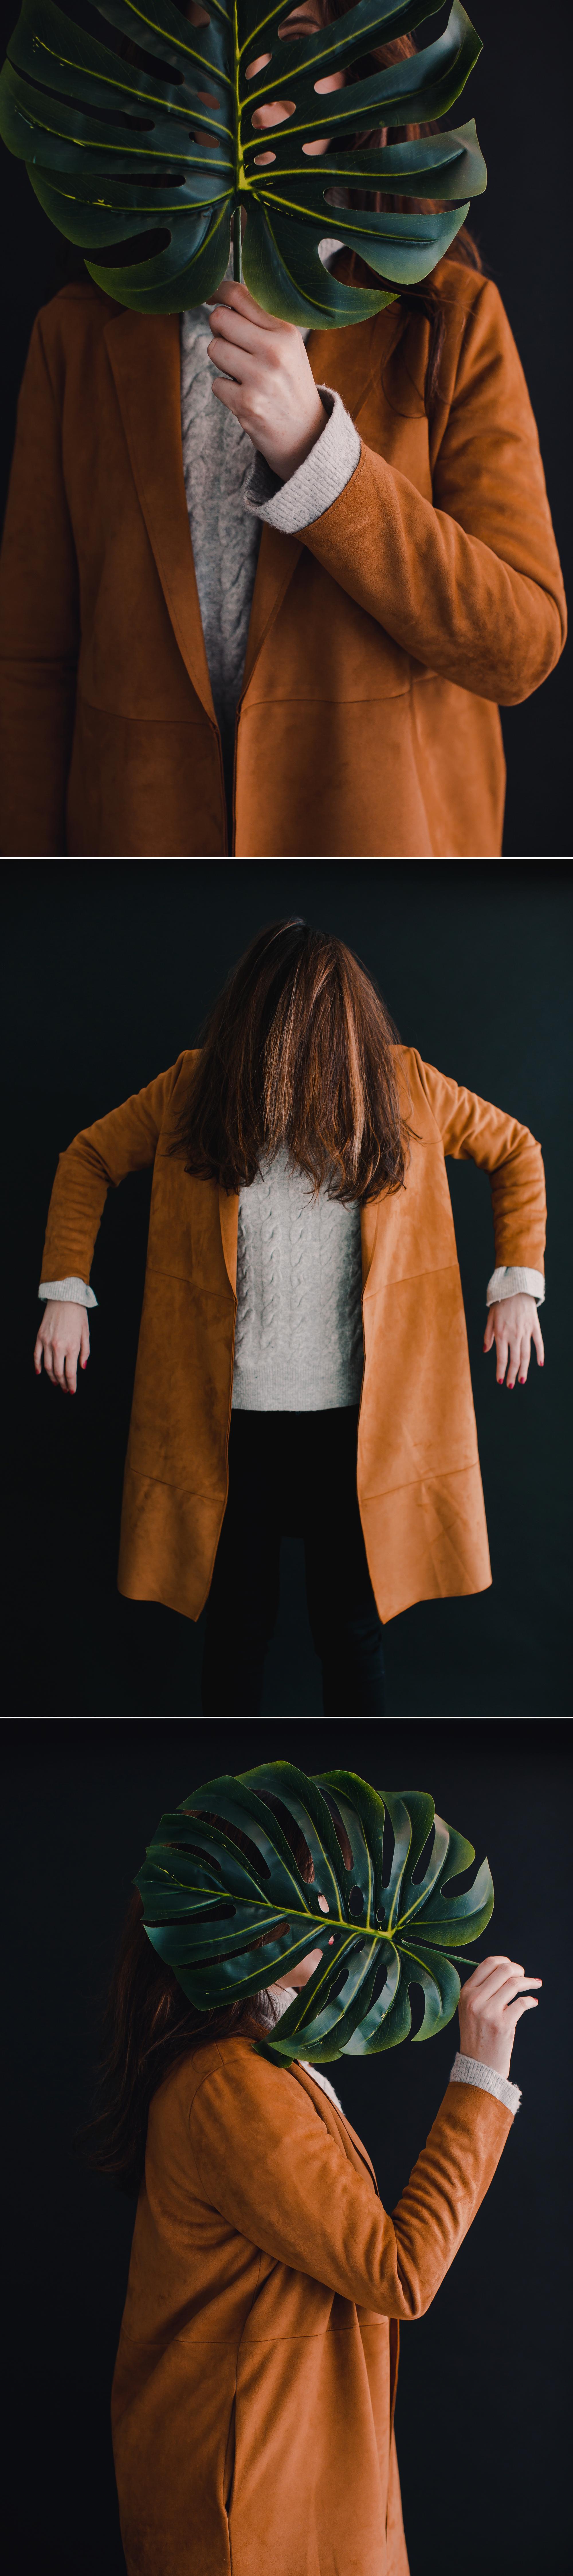 lifestyle-fashion-studio-portrait 4.jpg